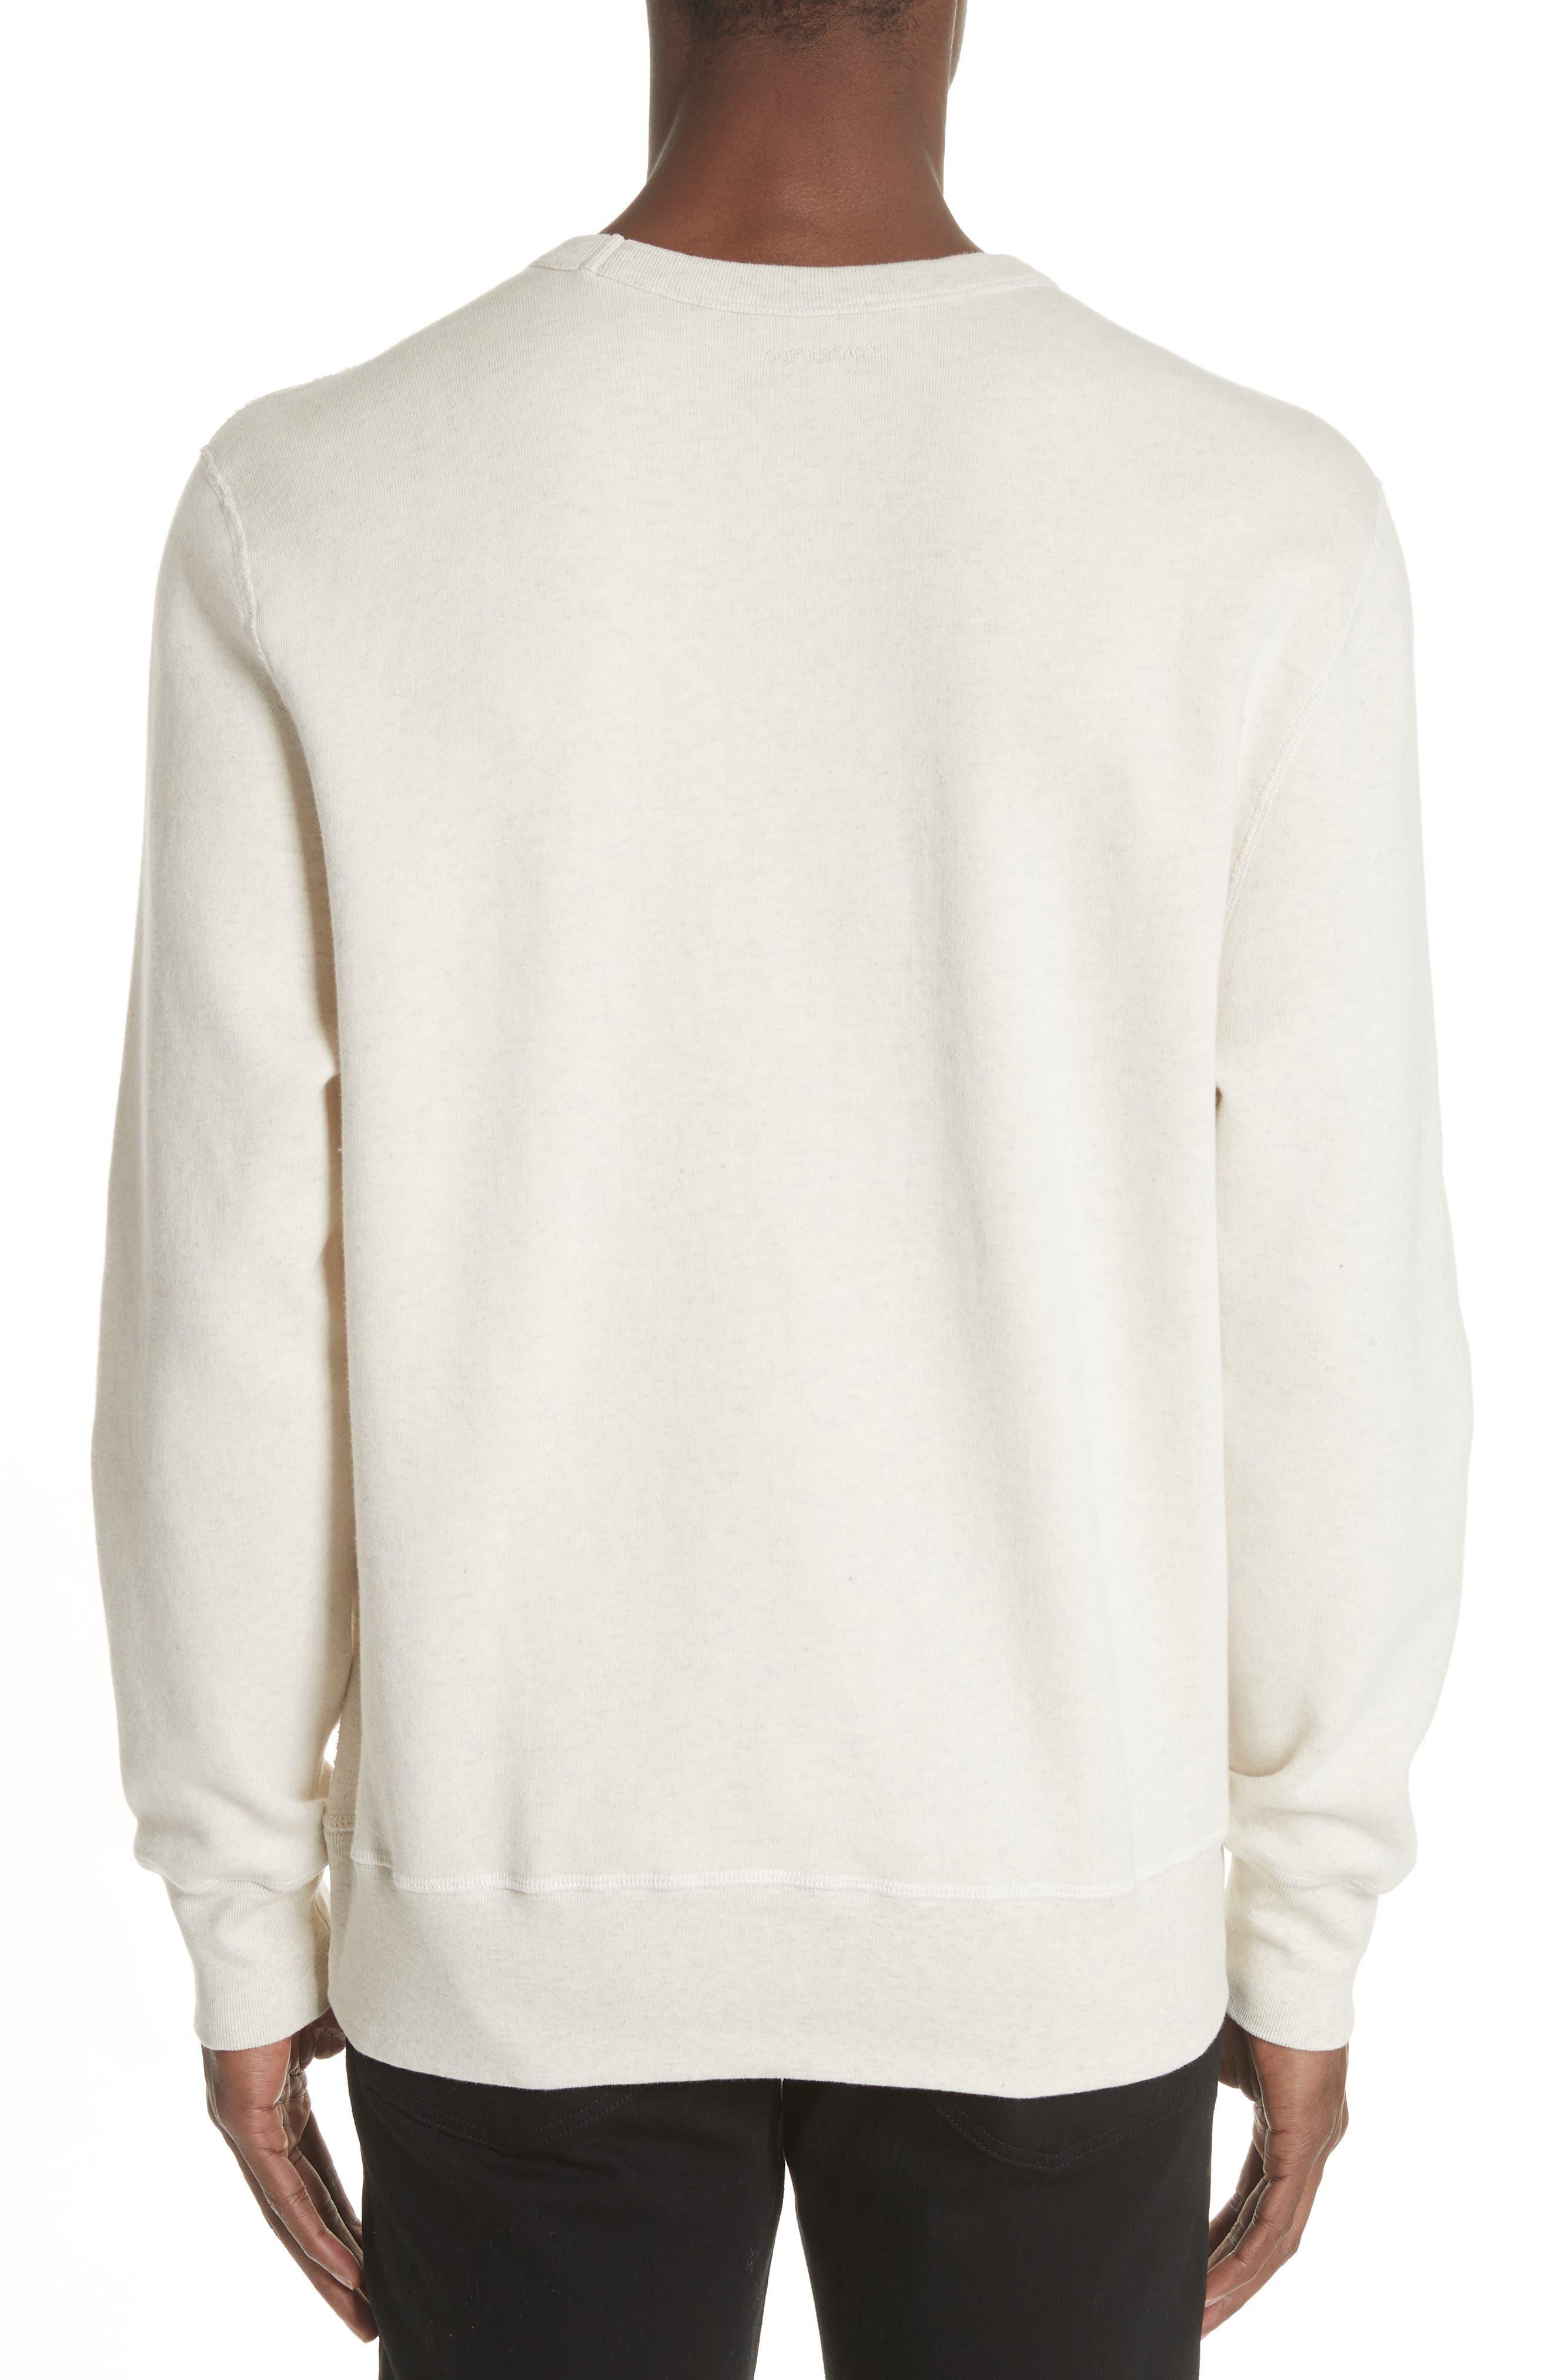 Crewneck Sweatshirt,                             Alternate thumbnail 2, color,                             050